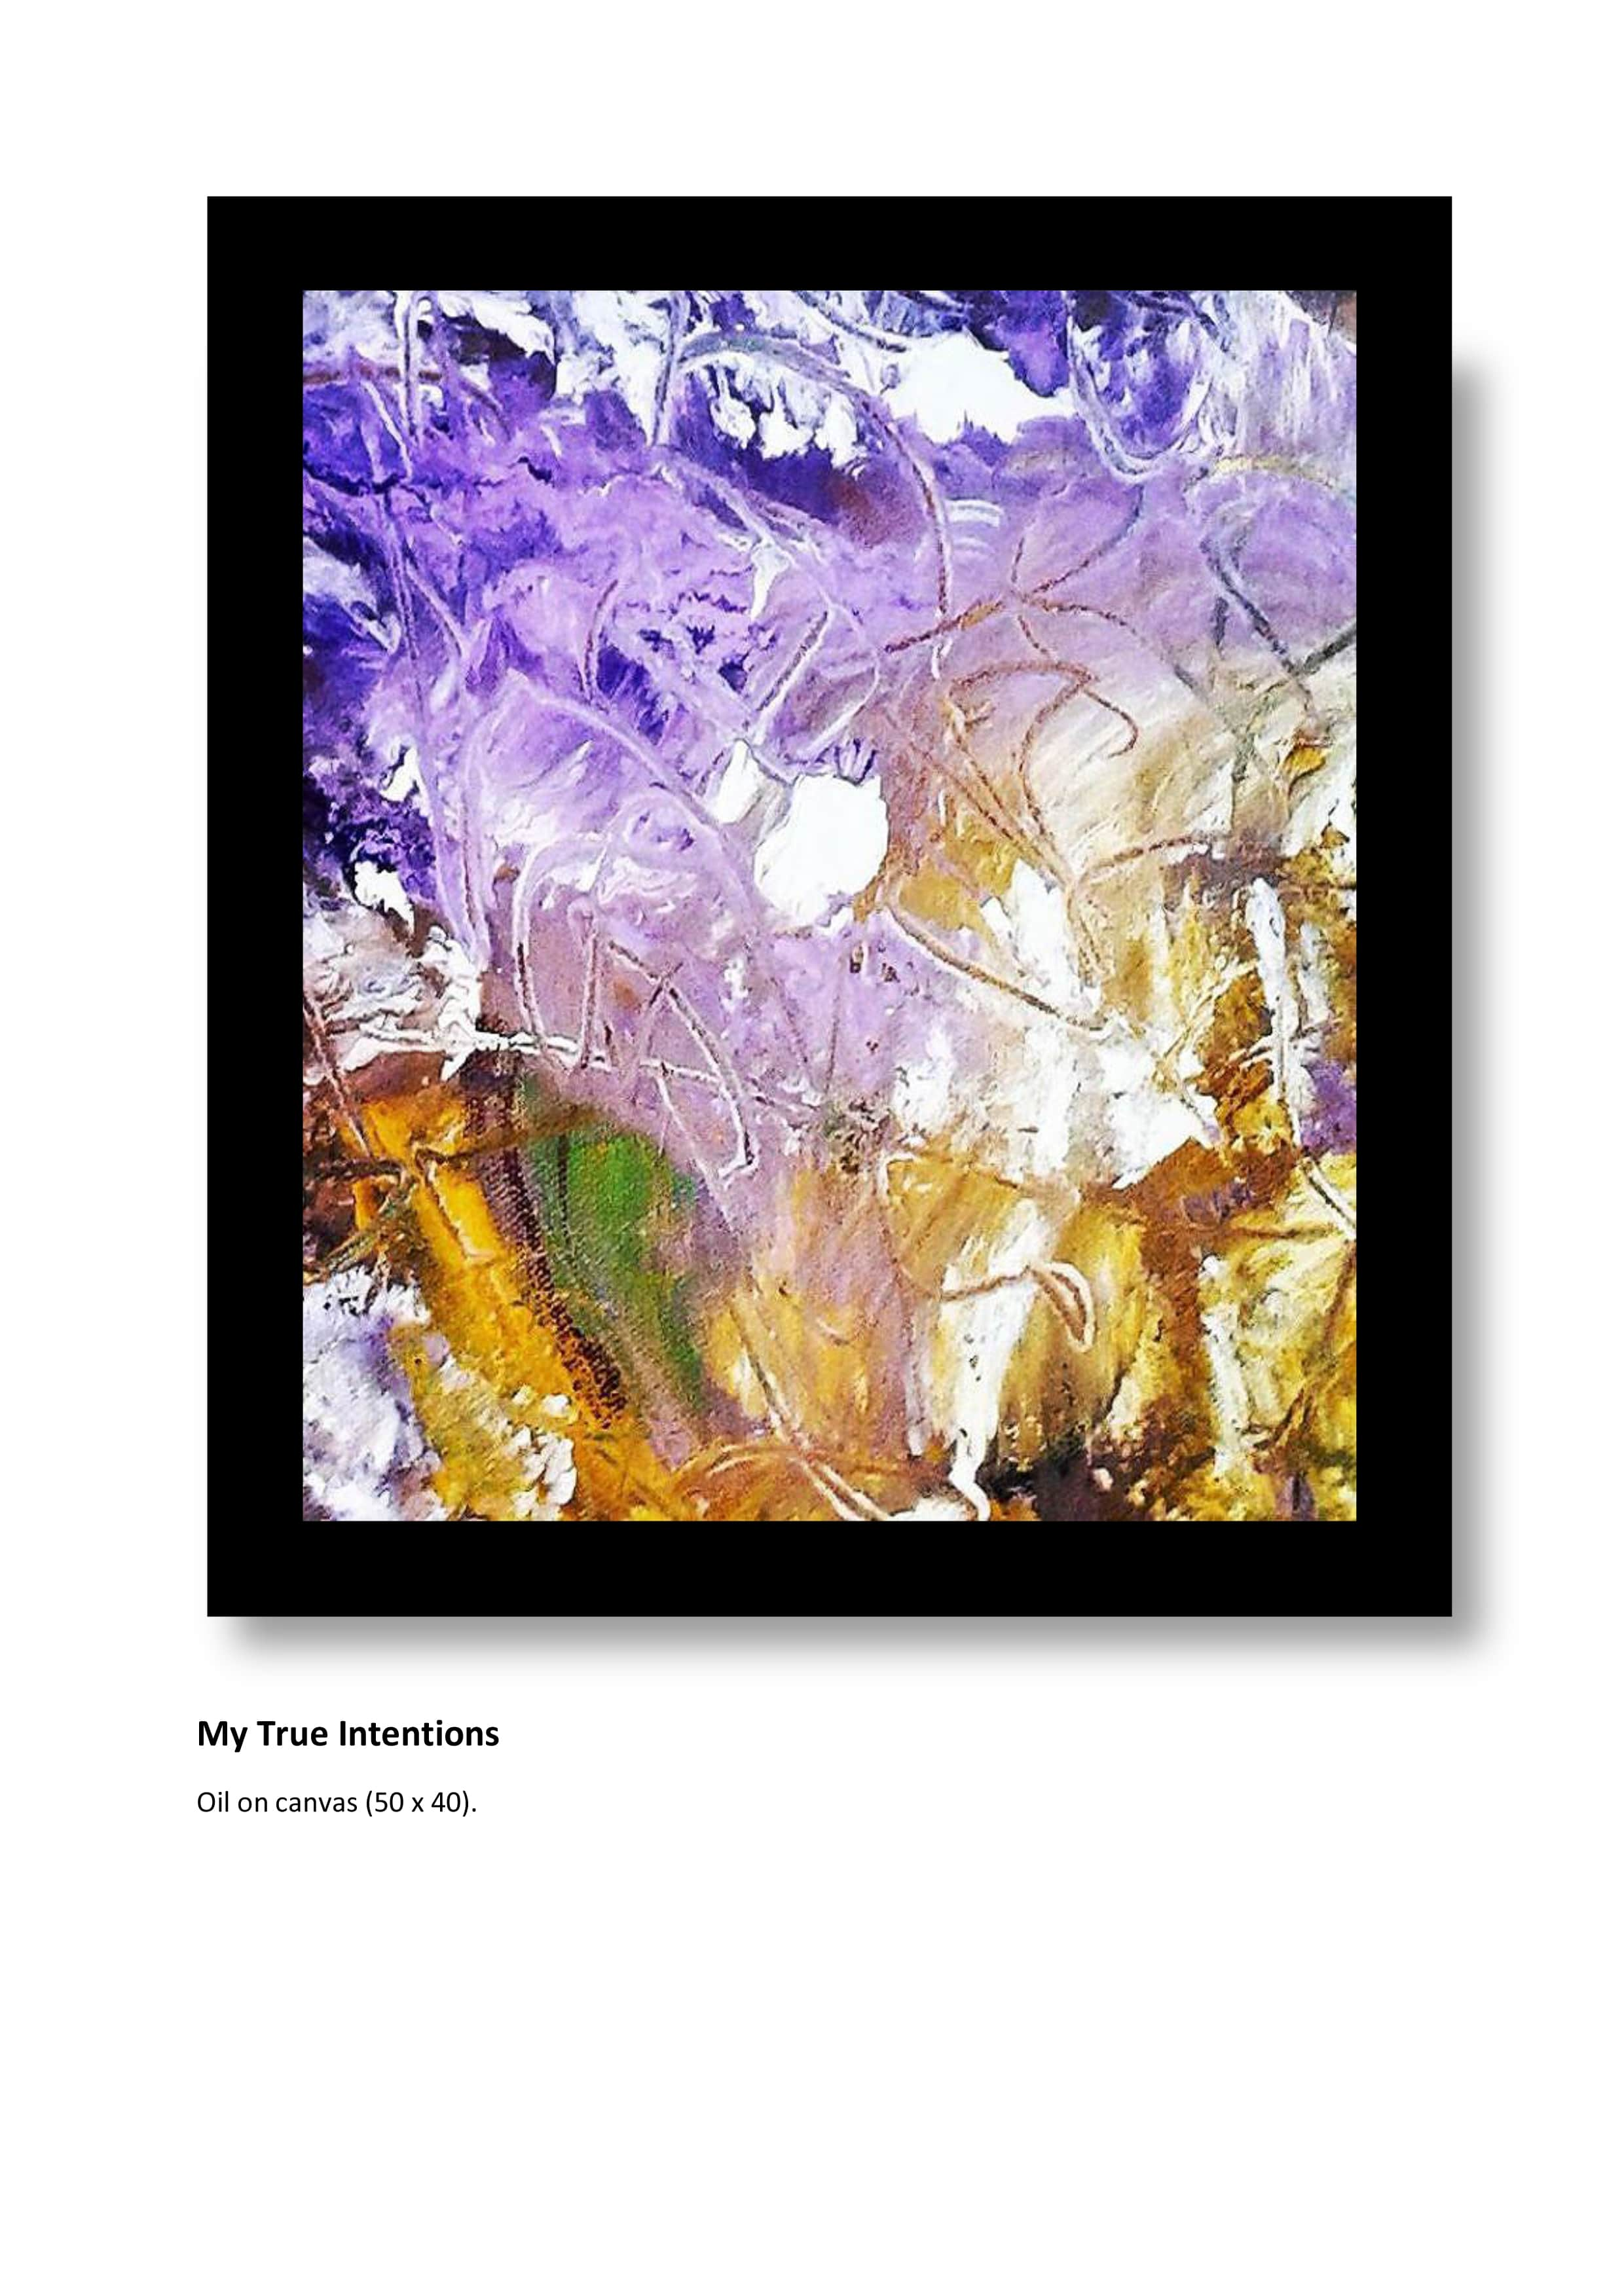 art-portfolio-aglae-corrected-13-min.jpg